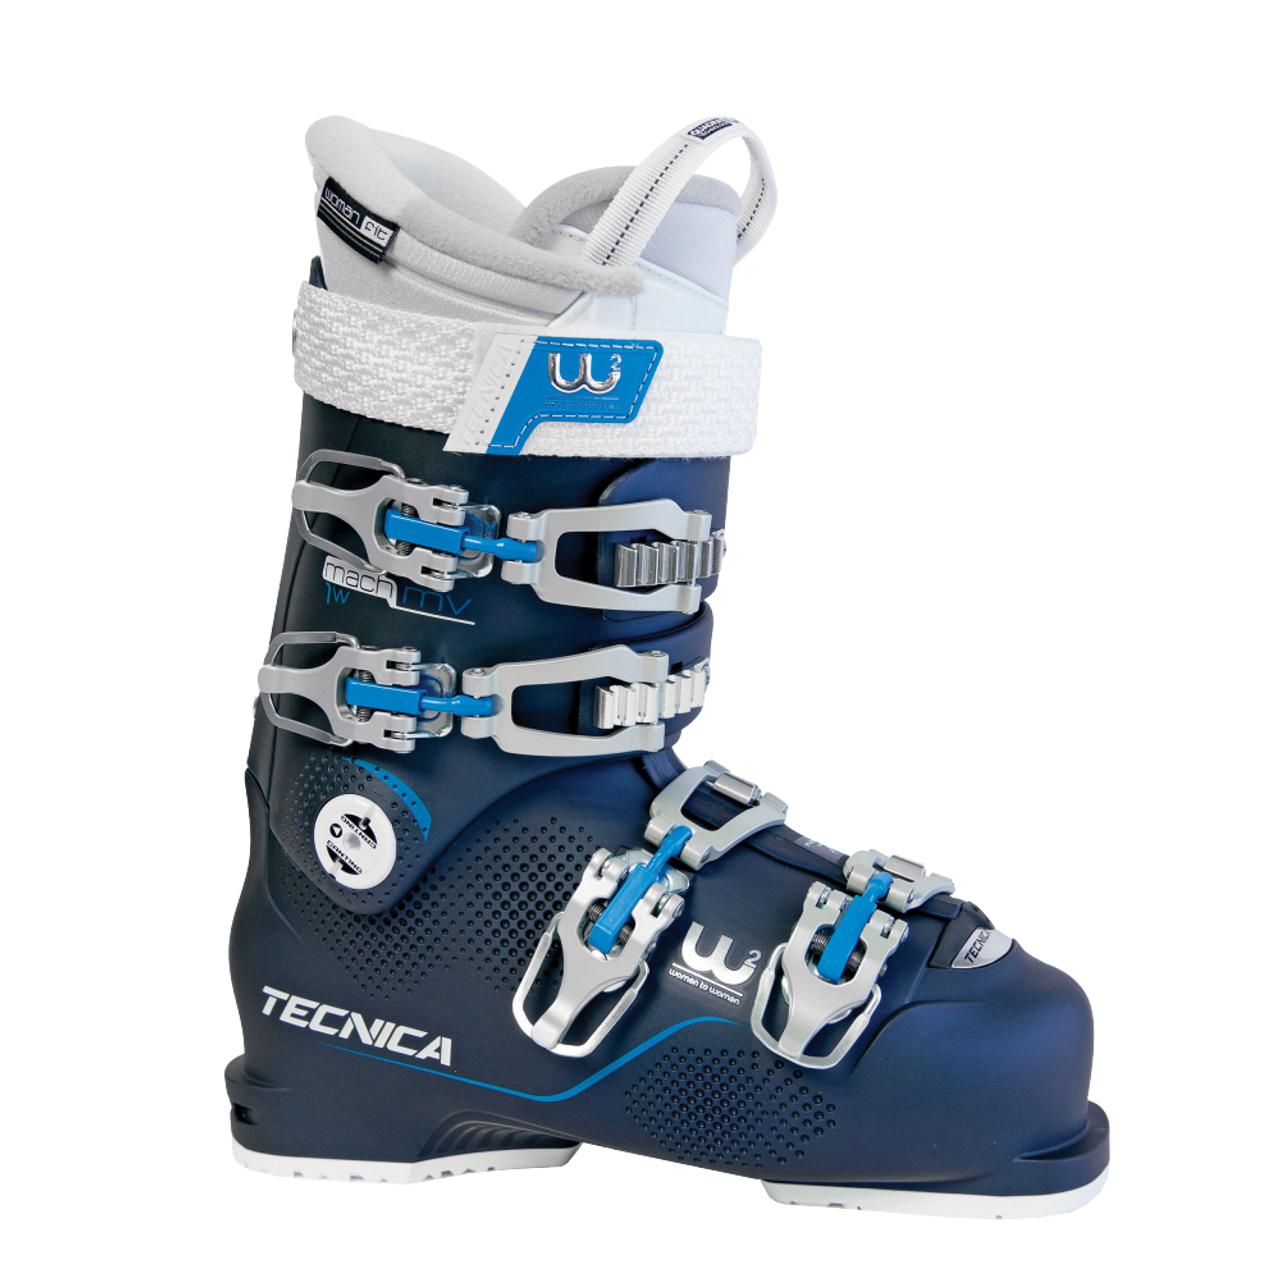 Technica Ski Boots   Women's Mach 1 75W MV   20149010869